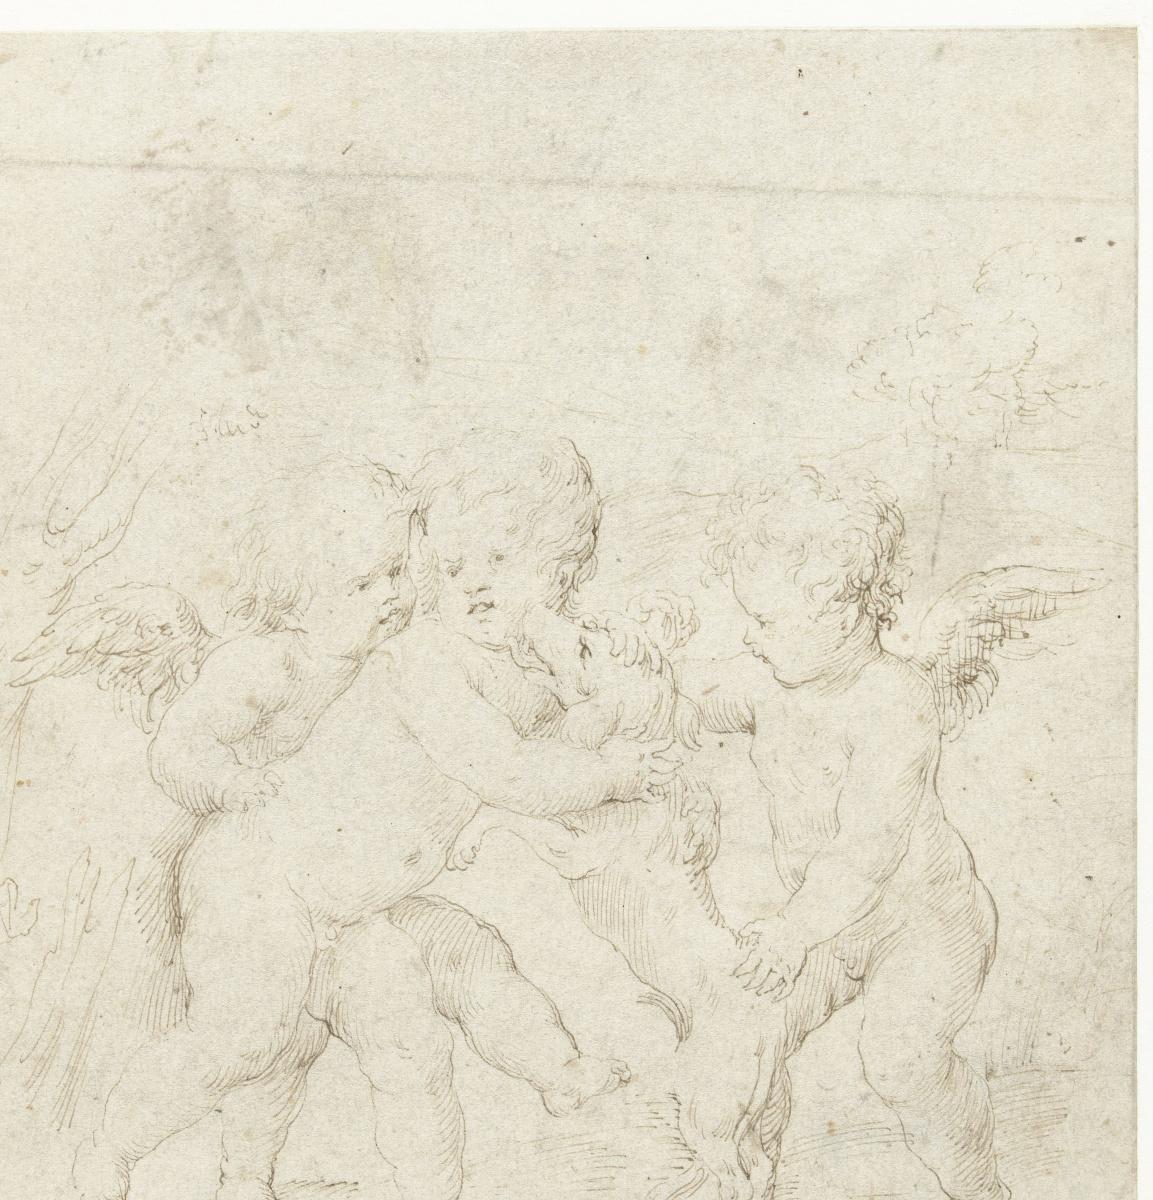 Anthony van Dyck. Three putti with a dog